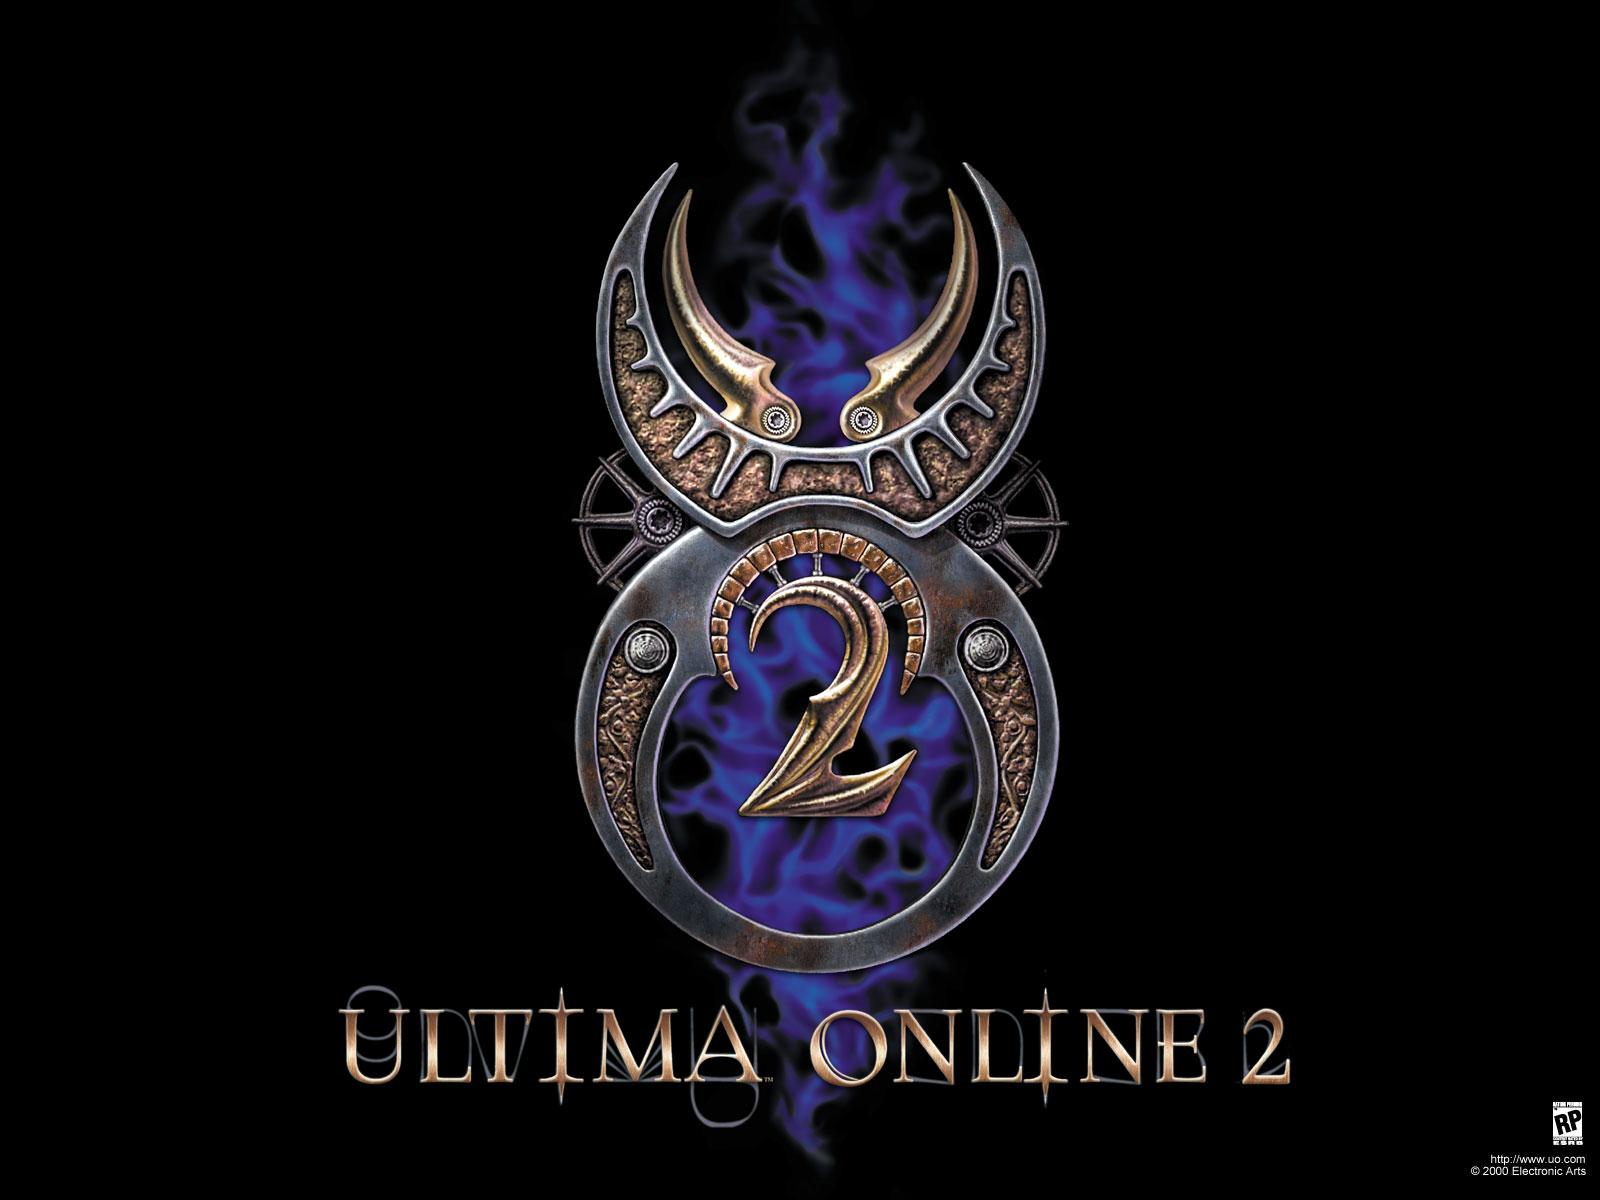 Ultima Online 2 Editable Codex Fandom Powered By Wikia Pin Wiring Diagram Symbol Legend On Pinterest